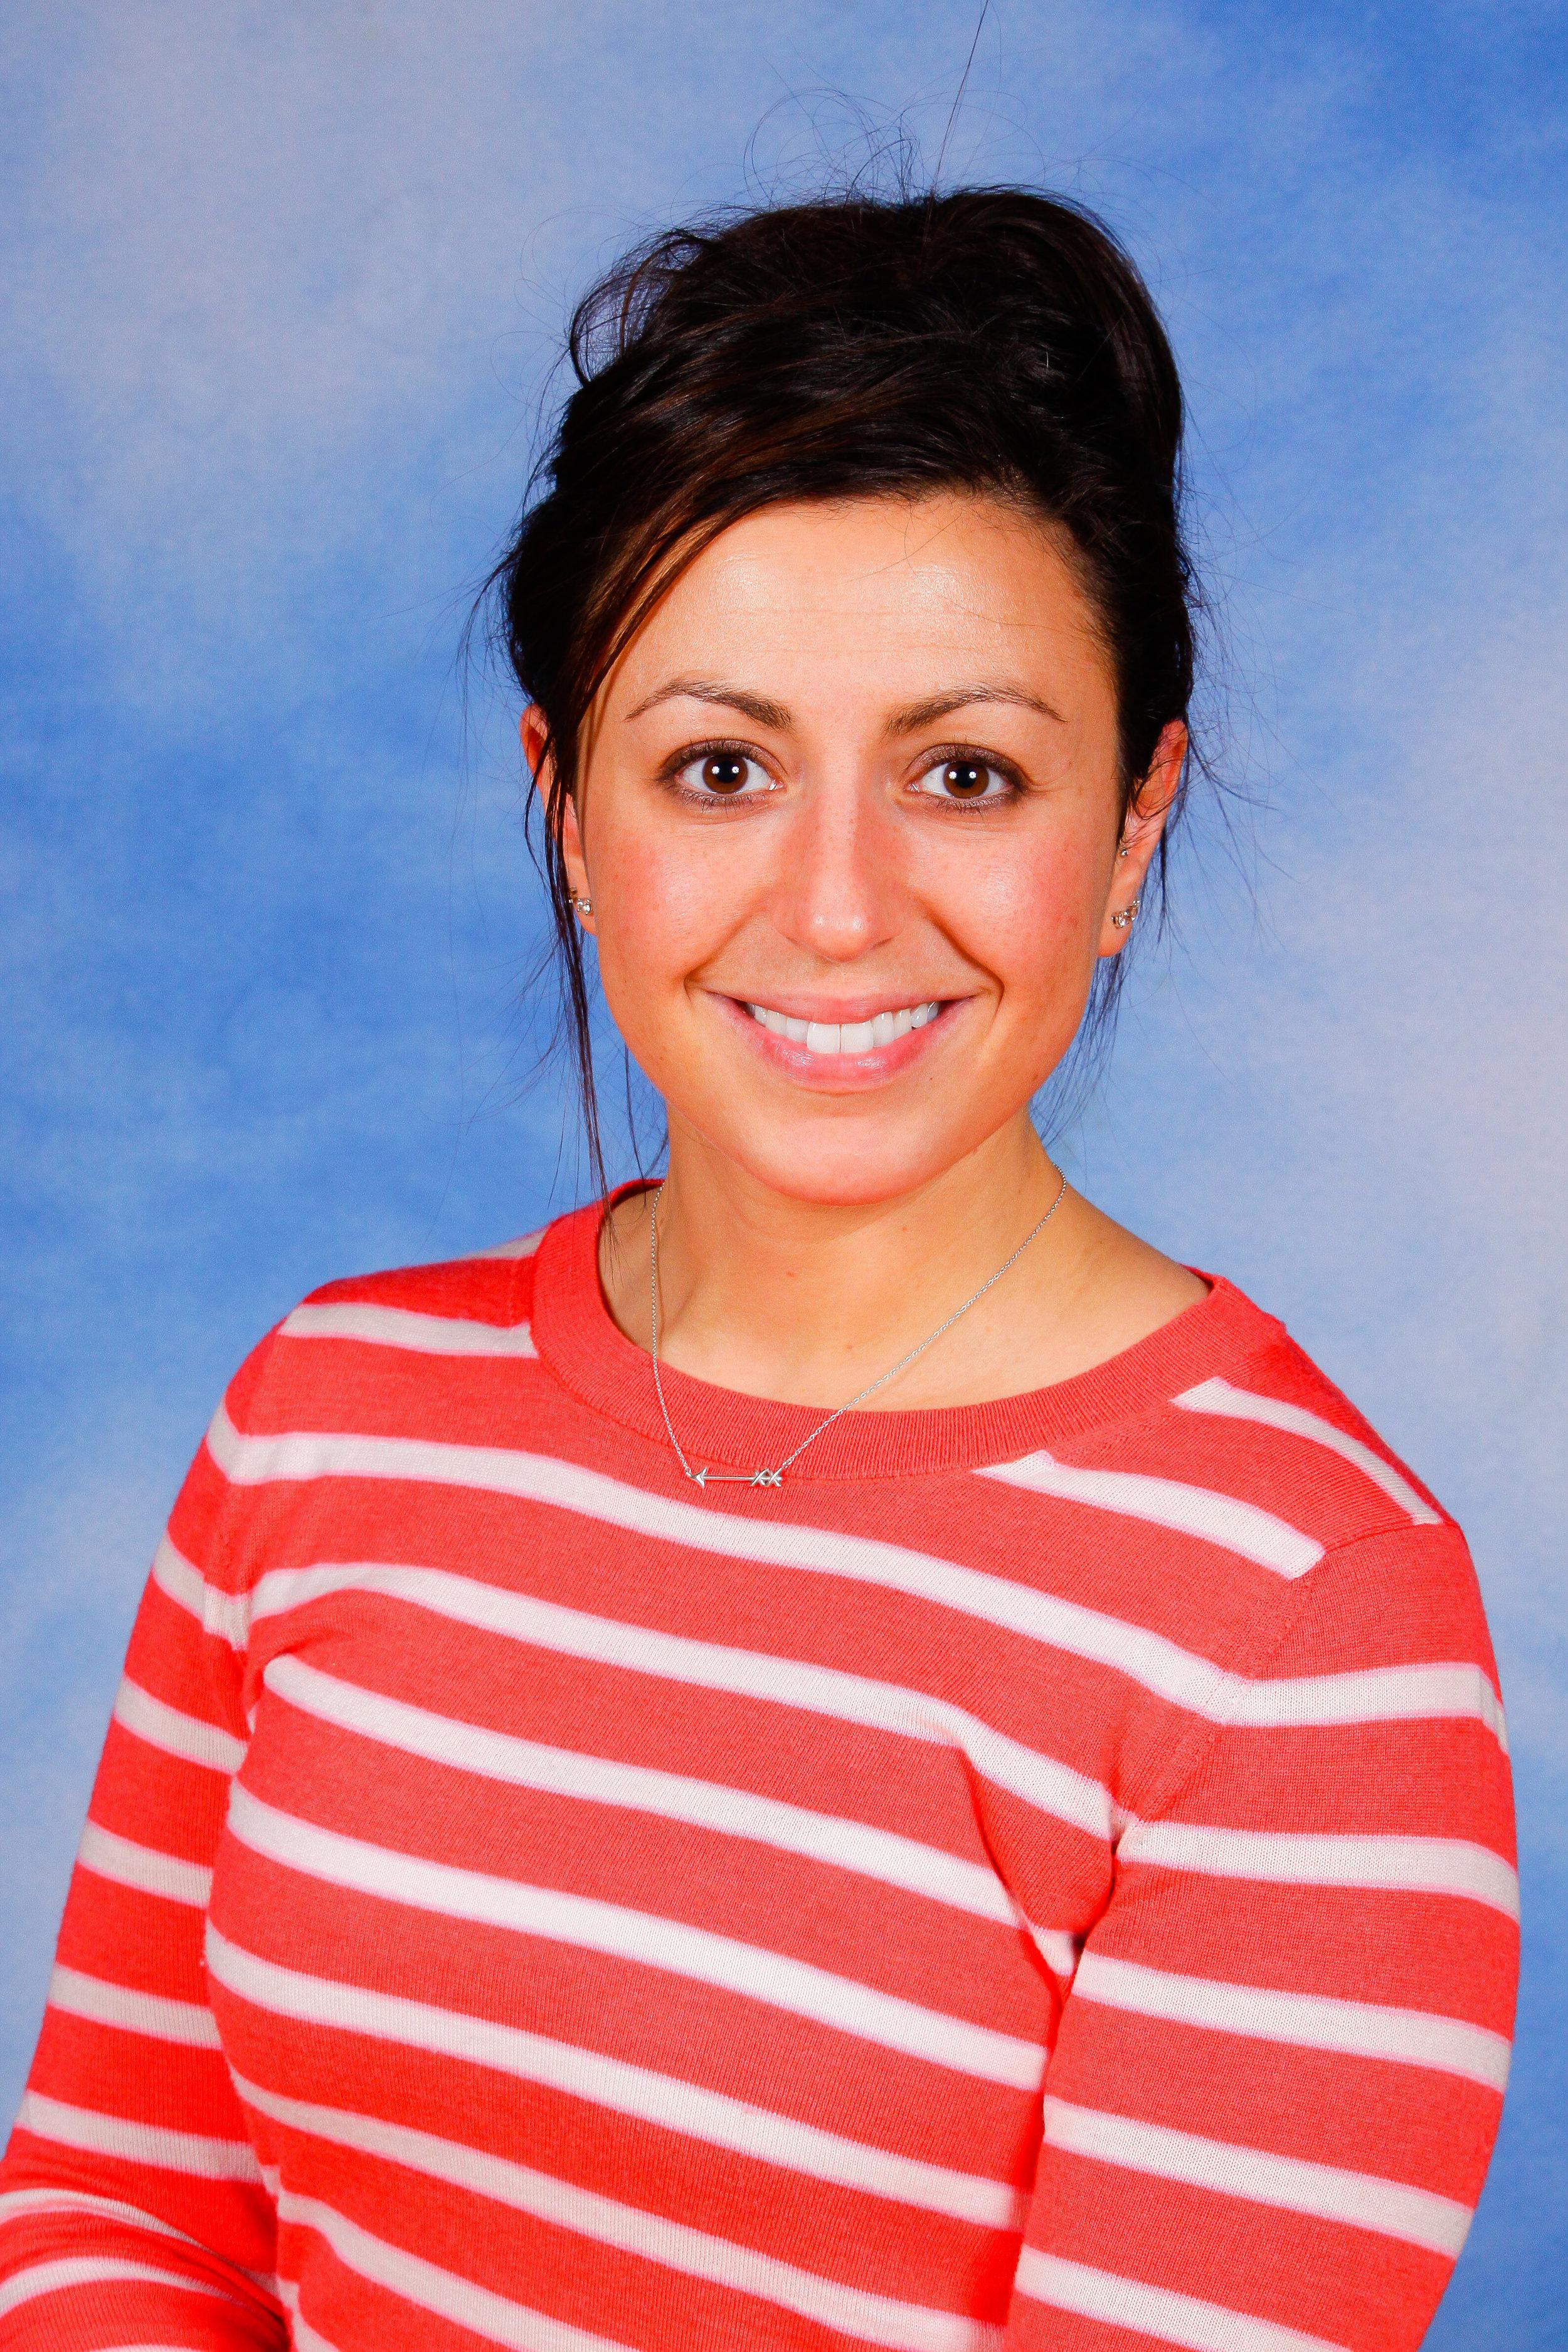 Ms. Degennaro